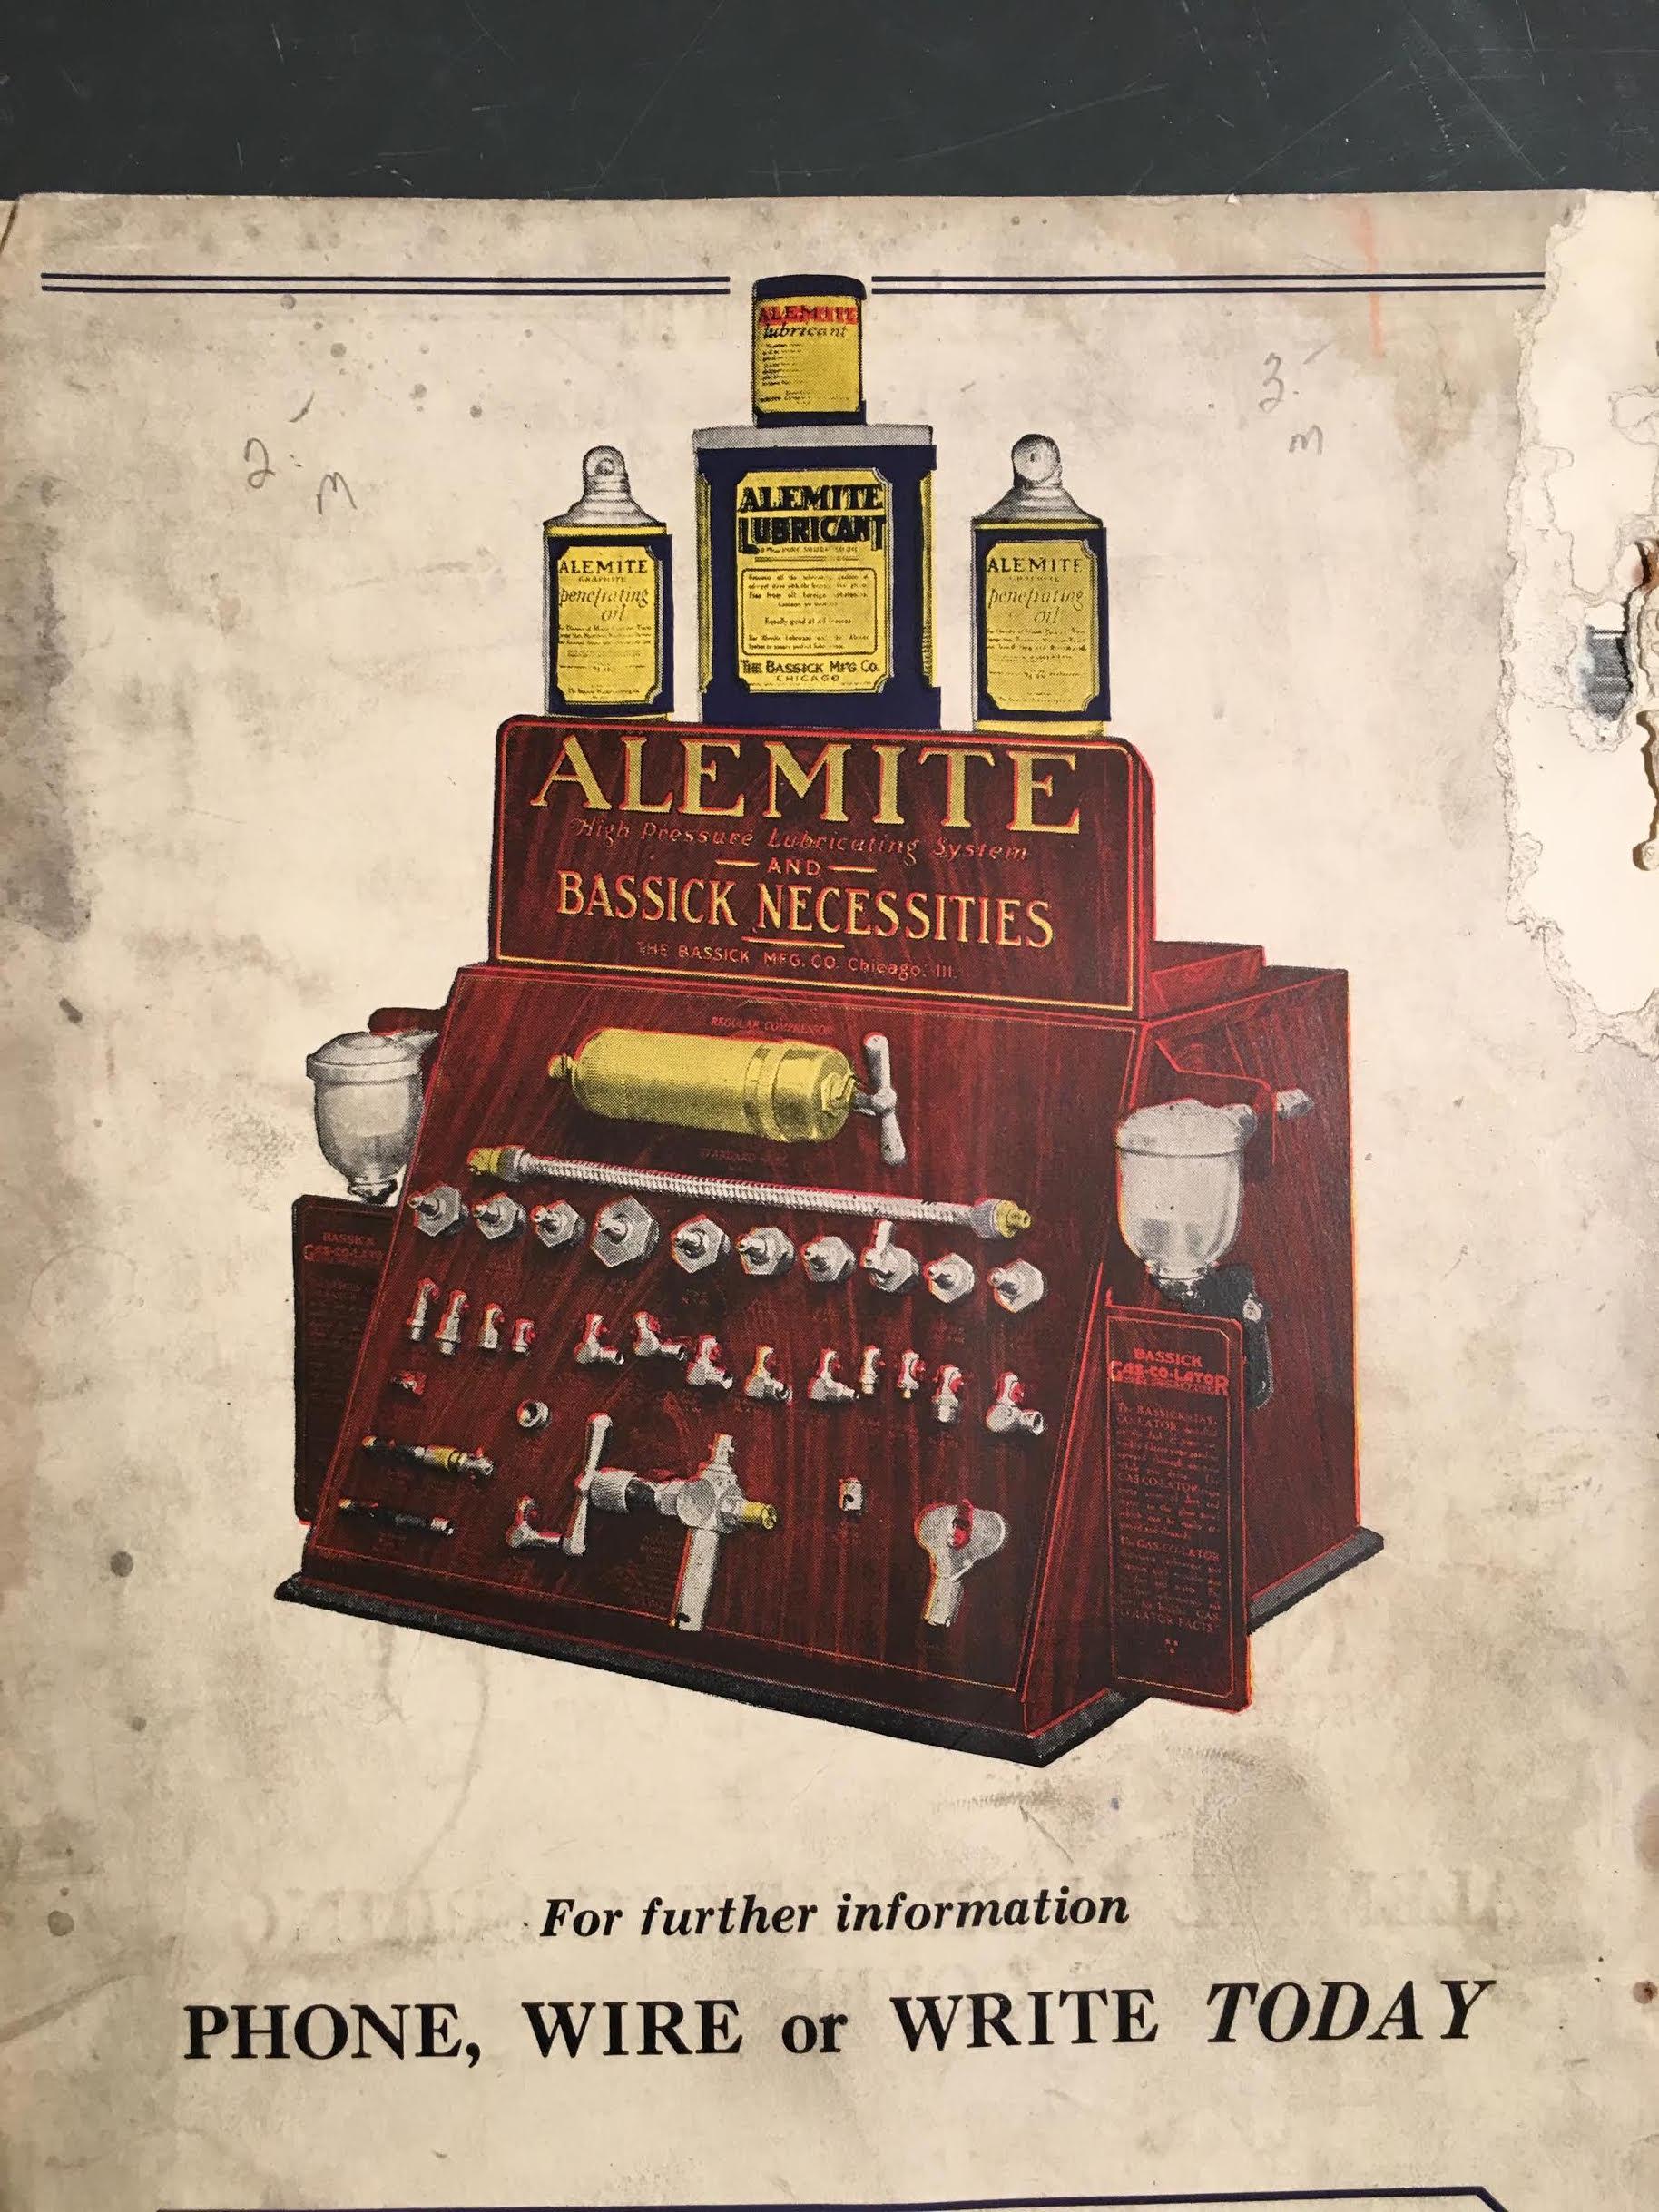 Alemite 1930's display